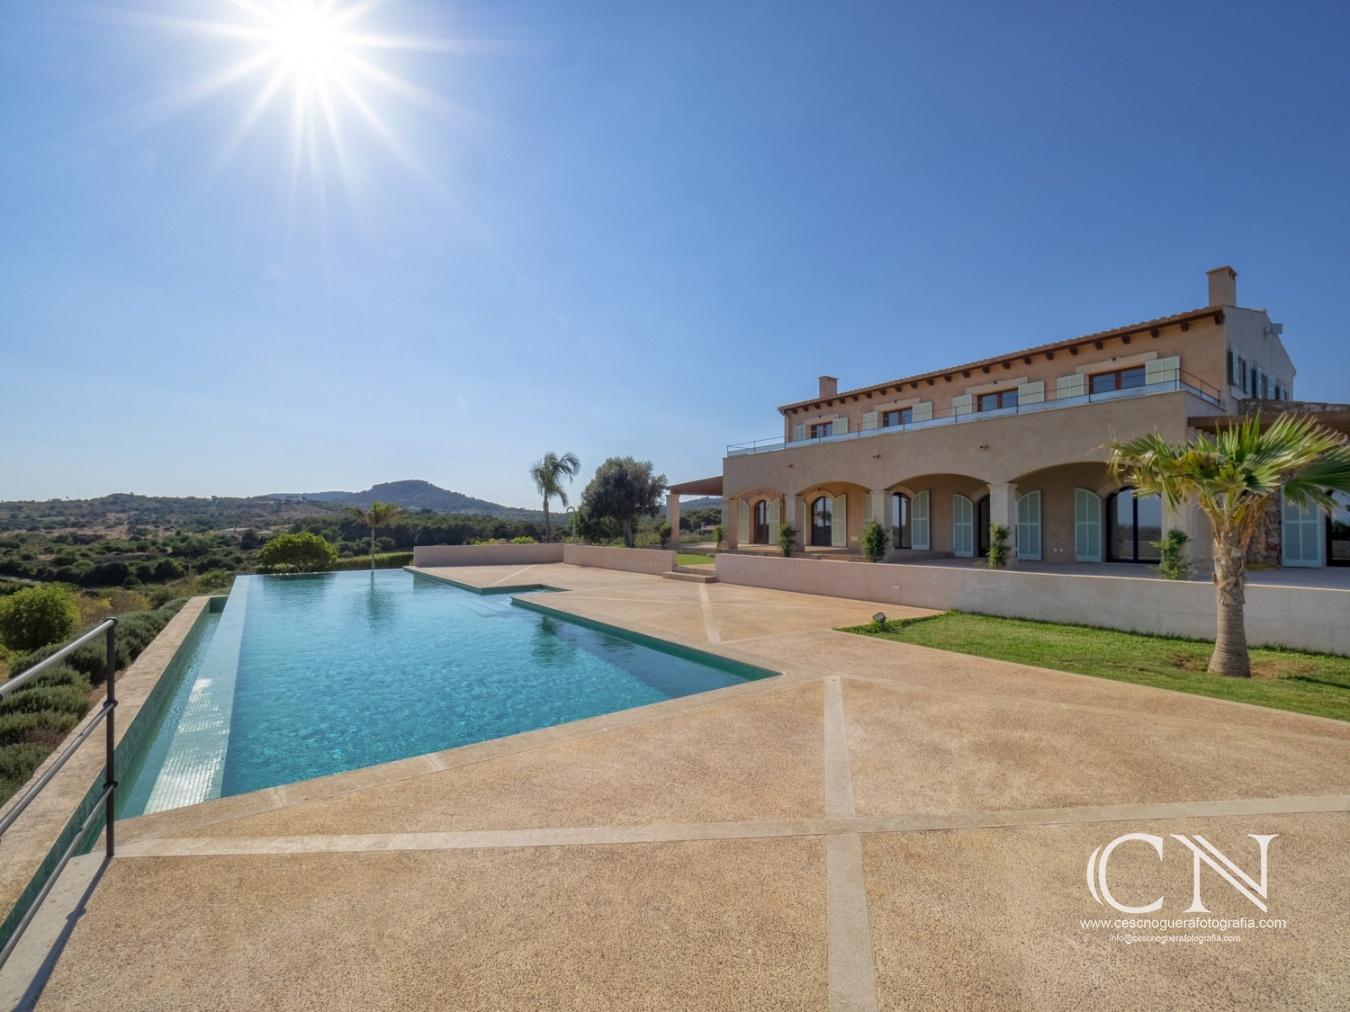 Finca a Santanyi - Cesc Noguera Fotografia,  Architectural & Interior design photographer / Landscape Photography.